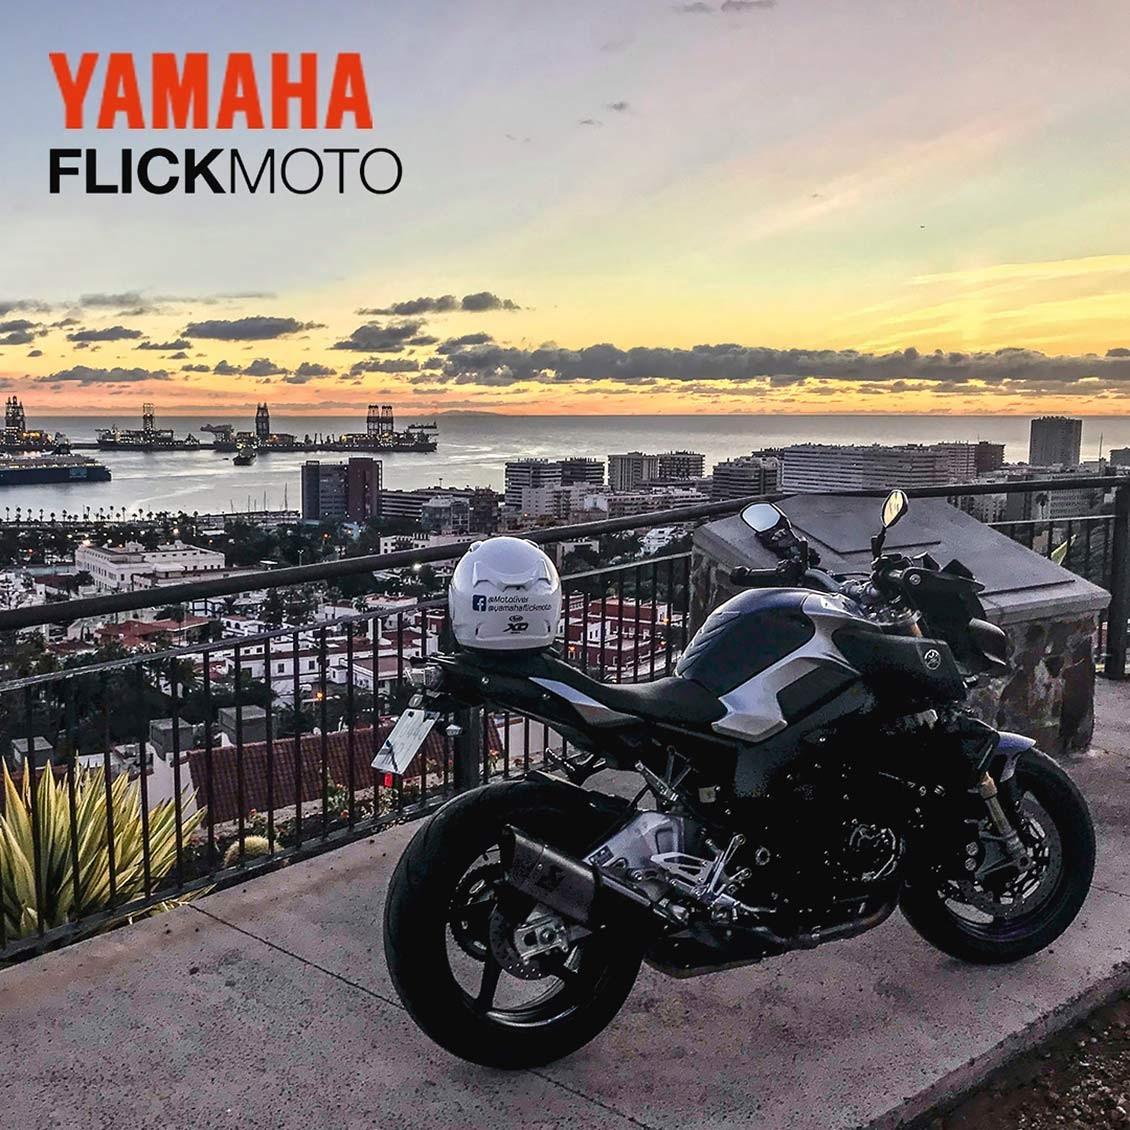 Ruta Yamaha Flick Moto 08/12/2018